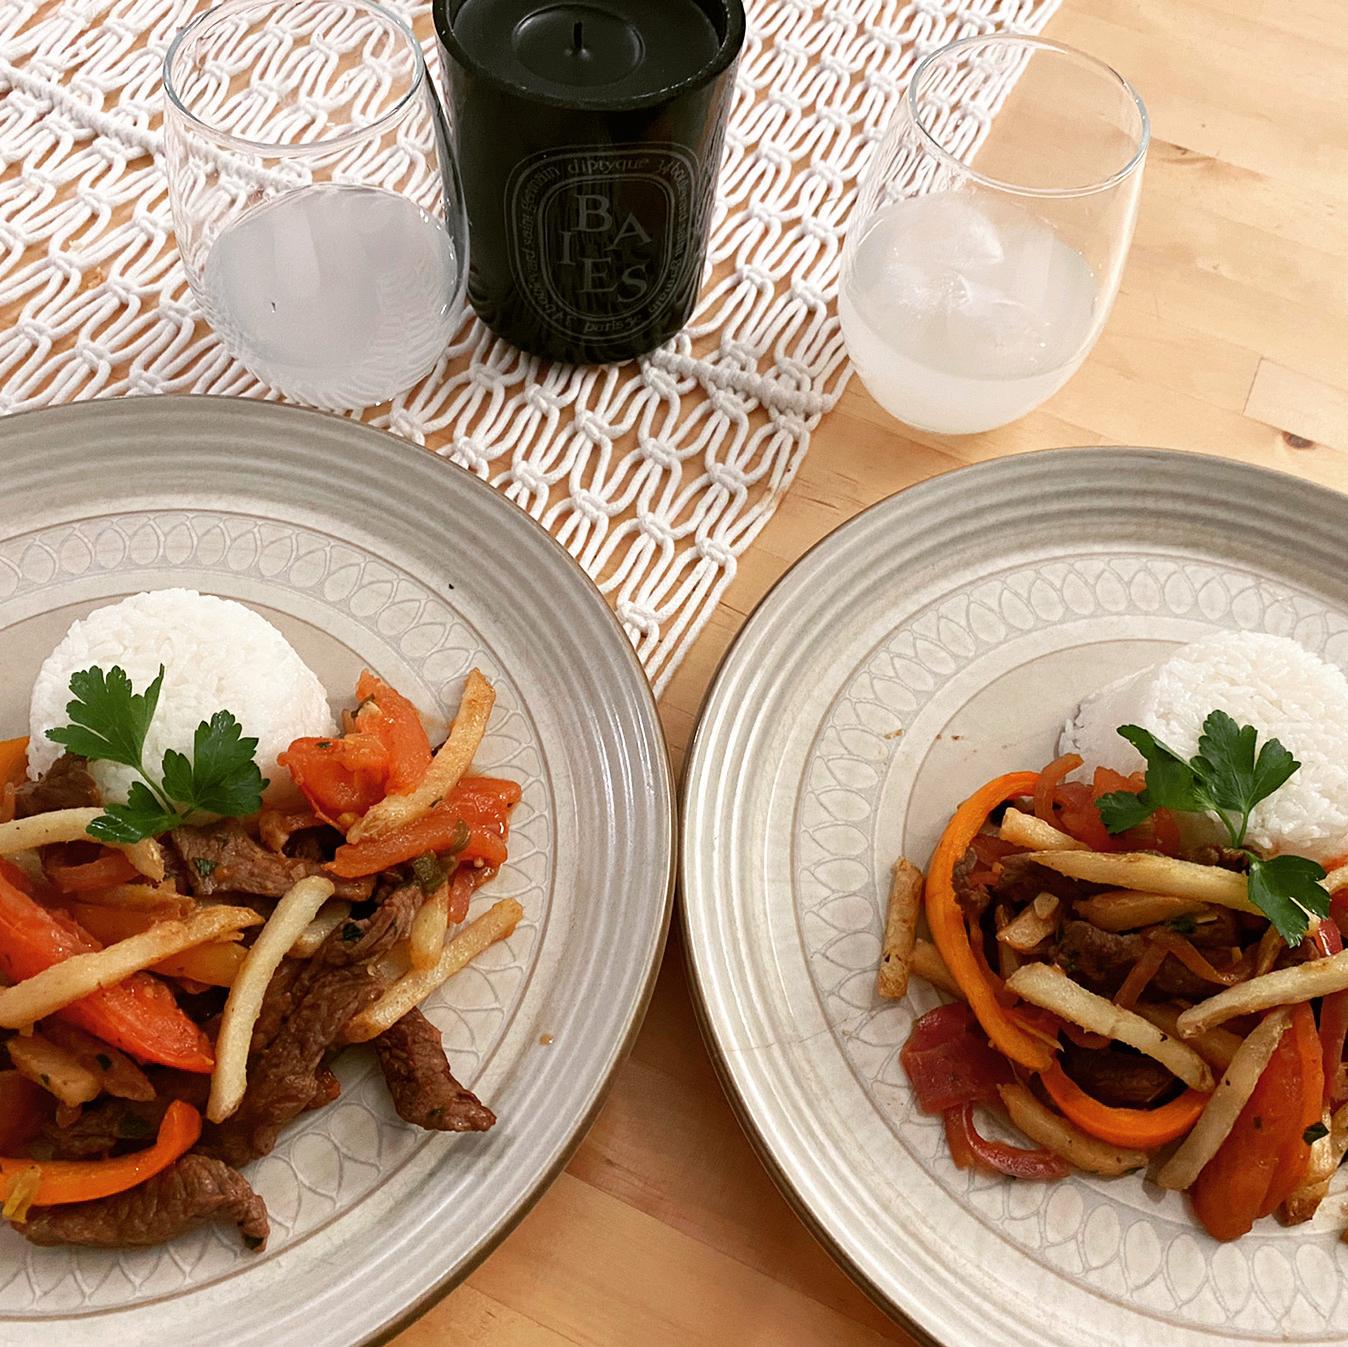 Lomo Saltado (Peruvian Steak Stir-Fry) Emily Yan